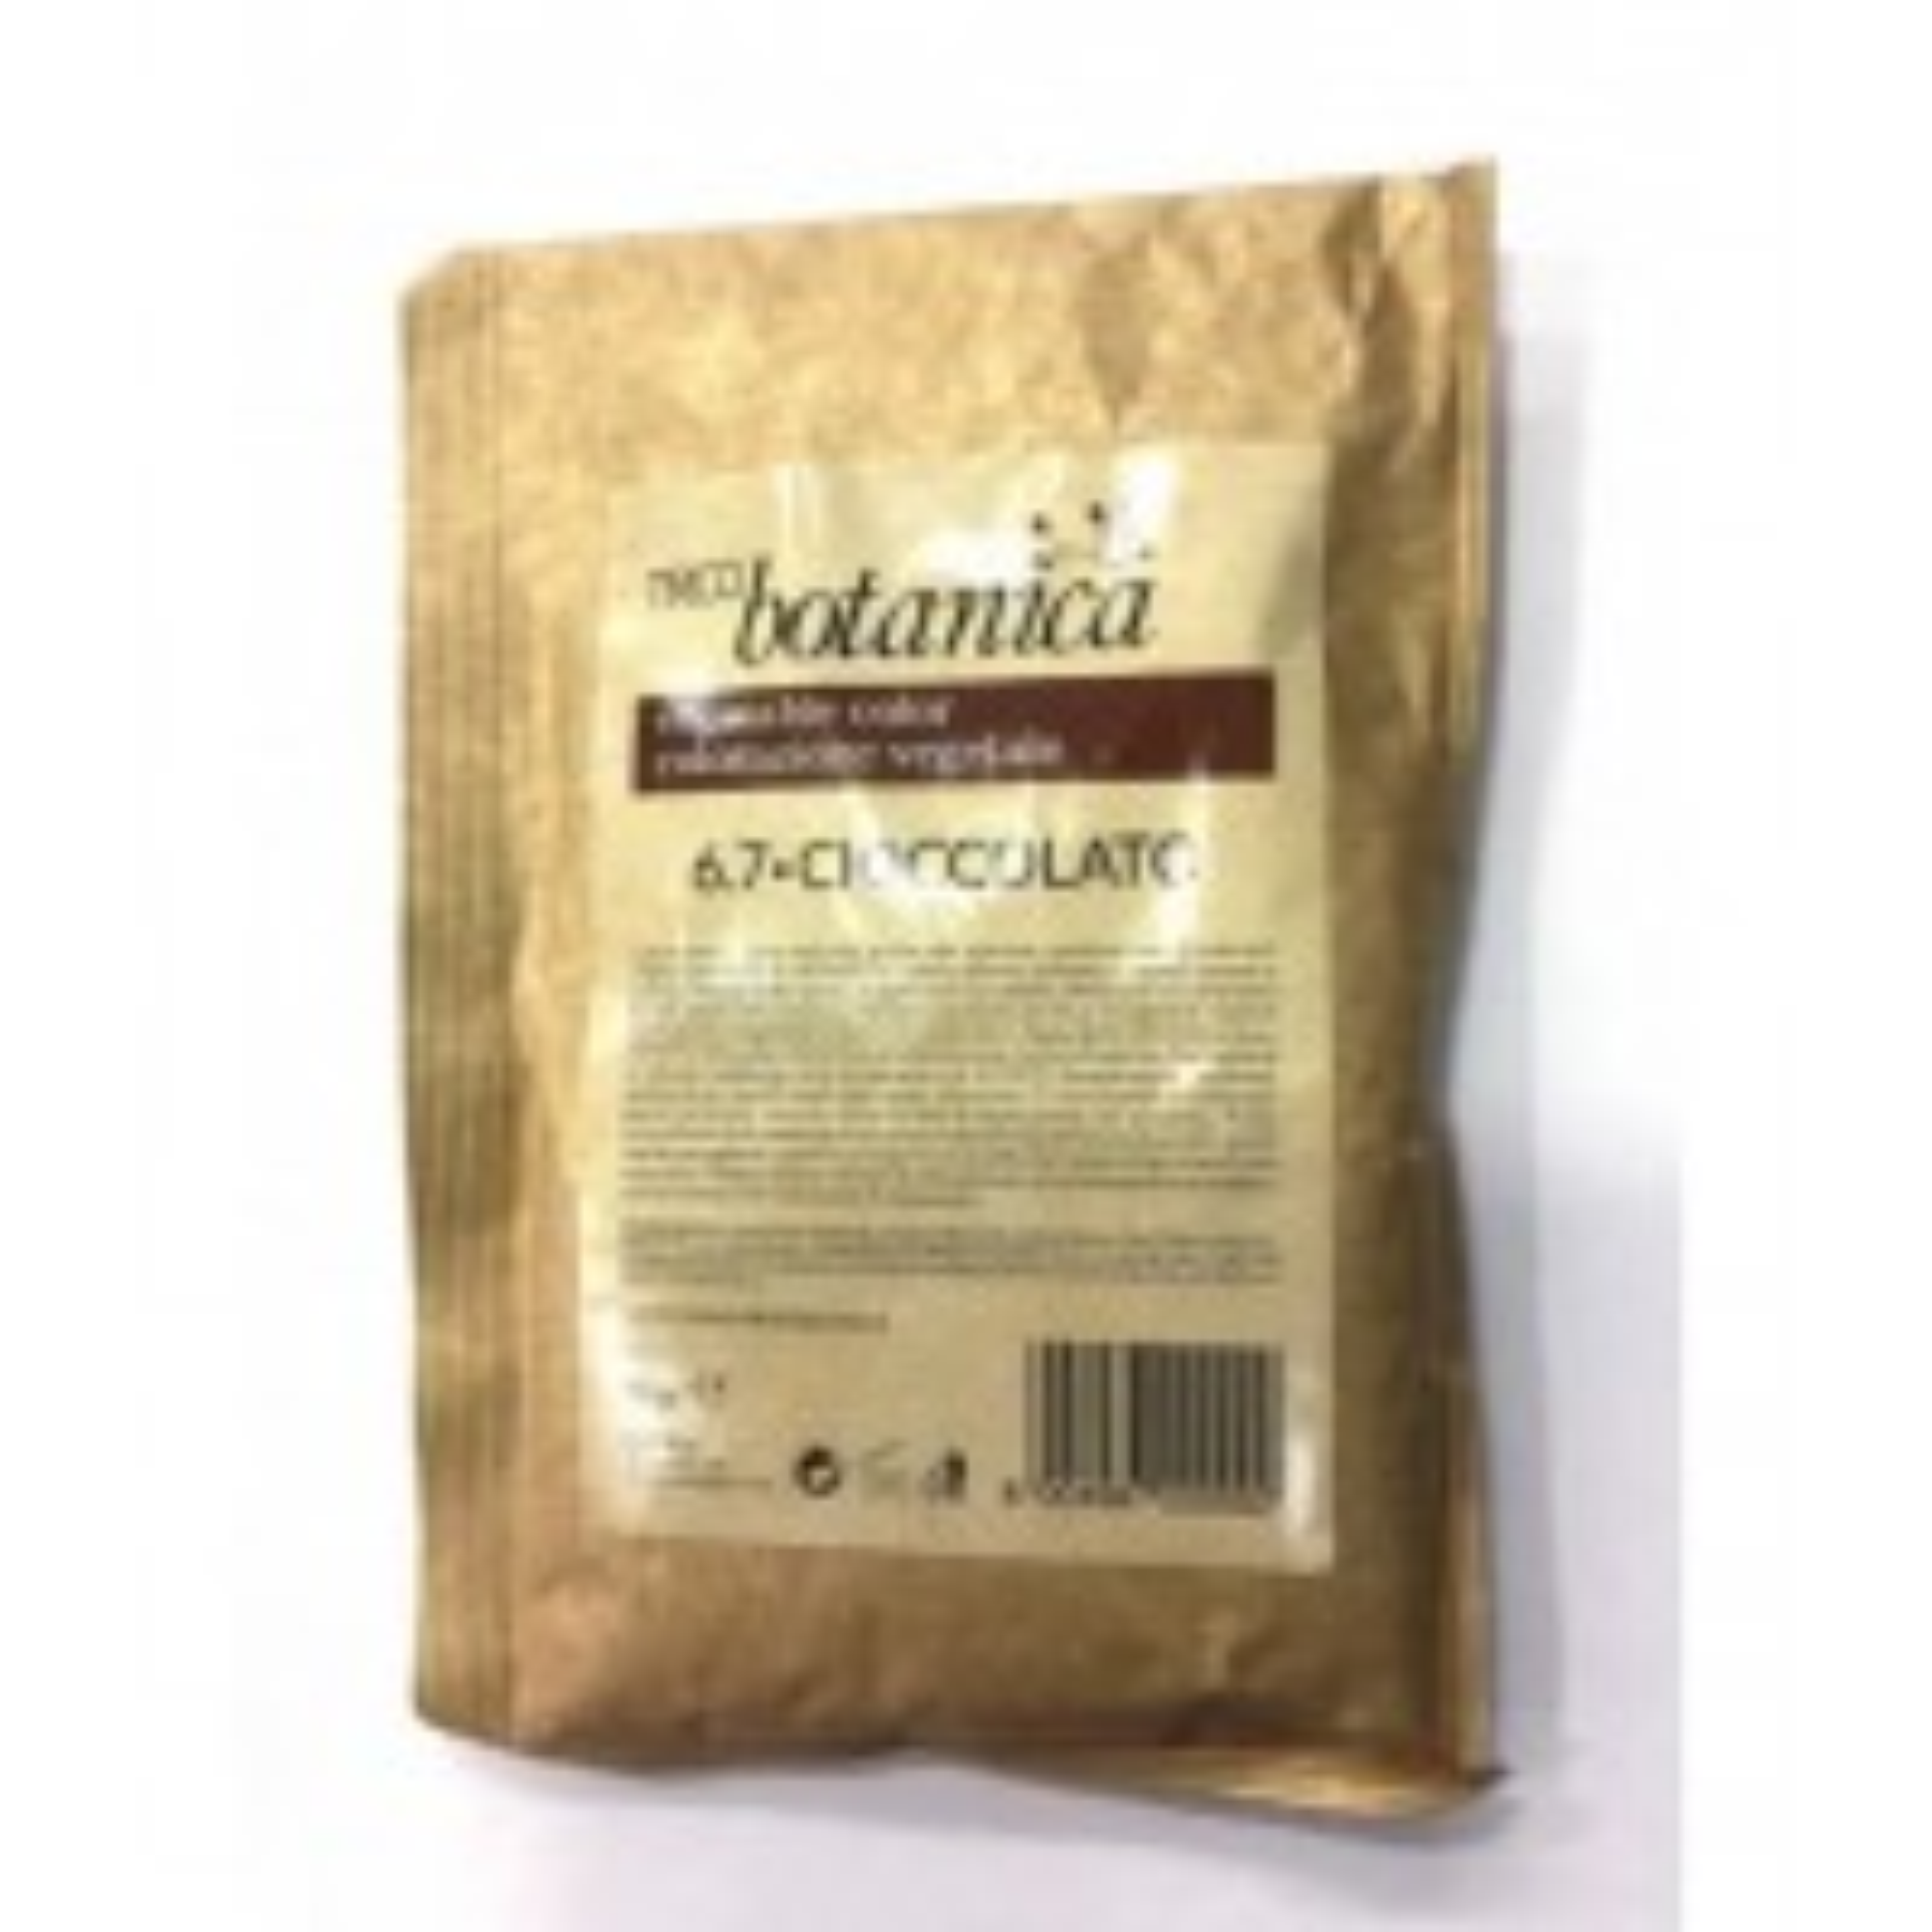 Trico Botanica Cioccolato 6.7